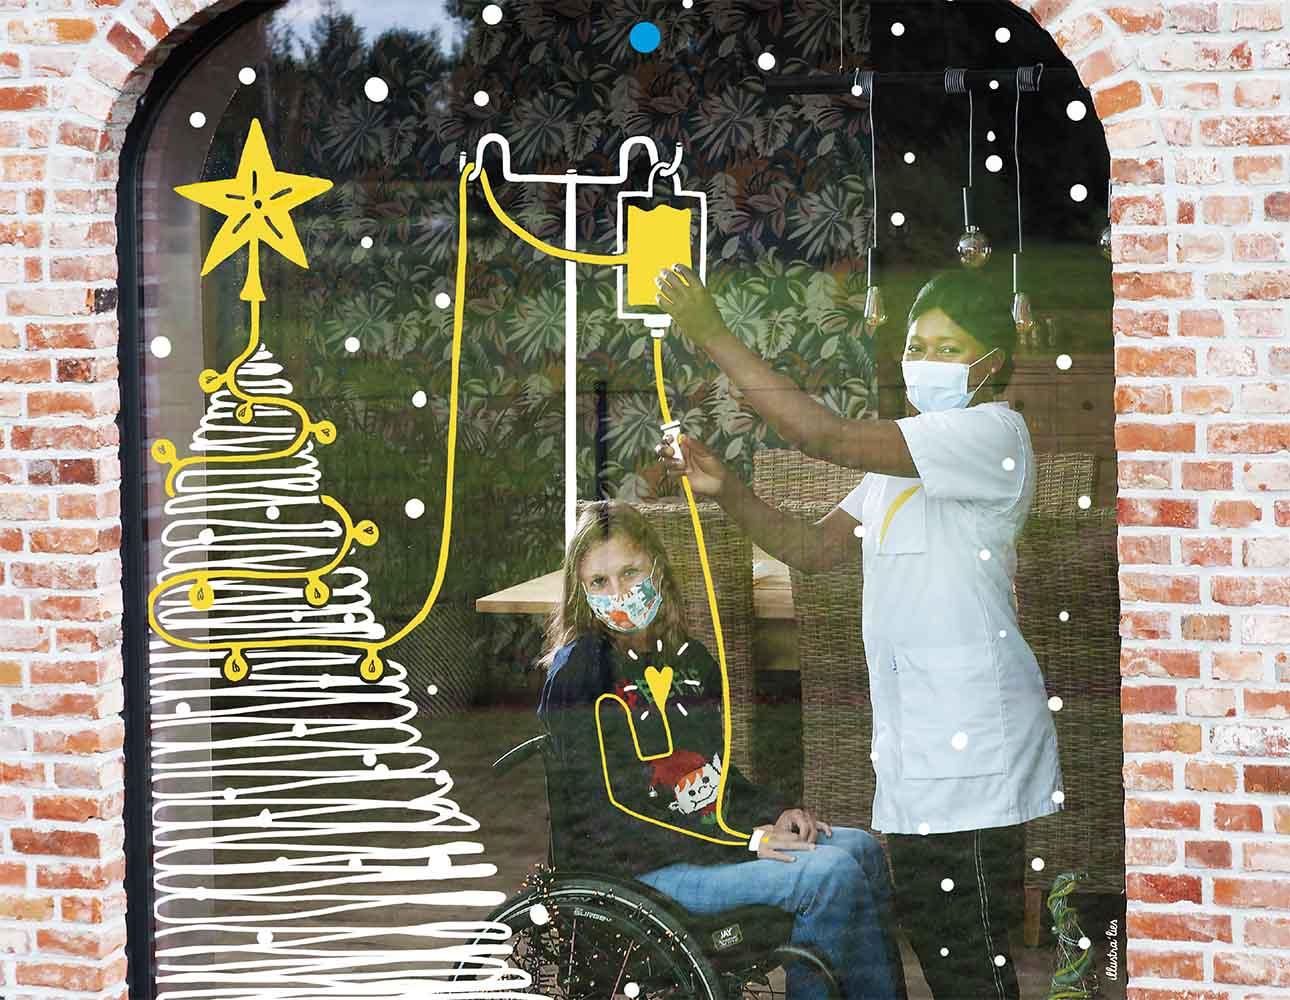 raamtekening illustraties voor kalender voor Wit-Gele kruis - kerstboom verpleegkundige en transfusie - illustra'lies